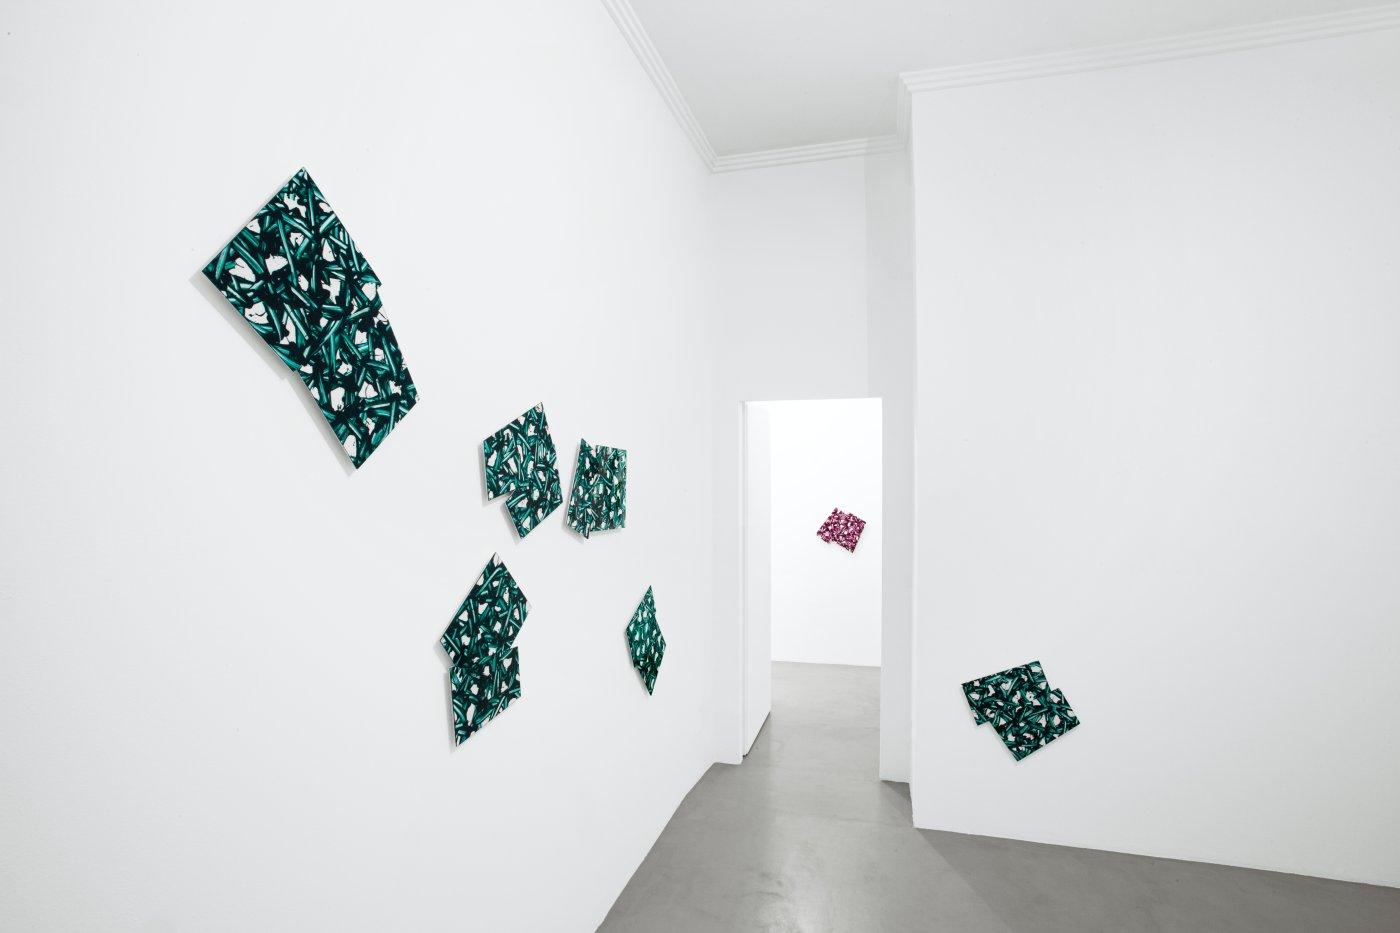 A Arte Invernizzi Gianni Asdrubali 4